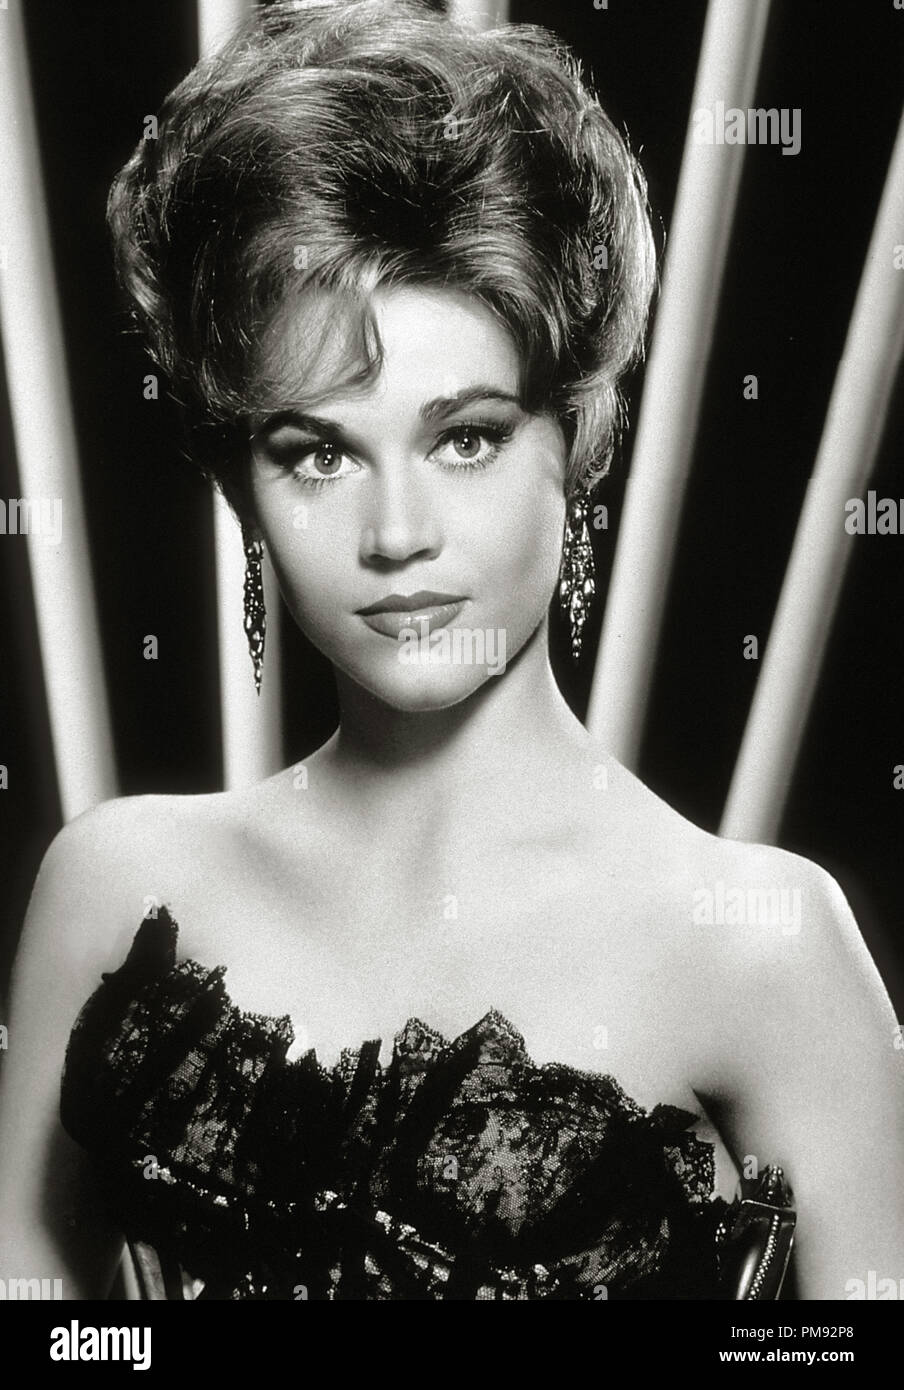 (Archivierung klassische Kino - Jane Fonda Retrospektive) Jane Fonda, ca. 1962 Datei Referenz # 31537_287 THA Stockbild